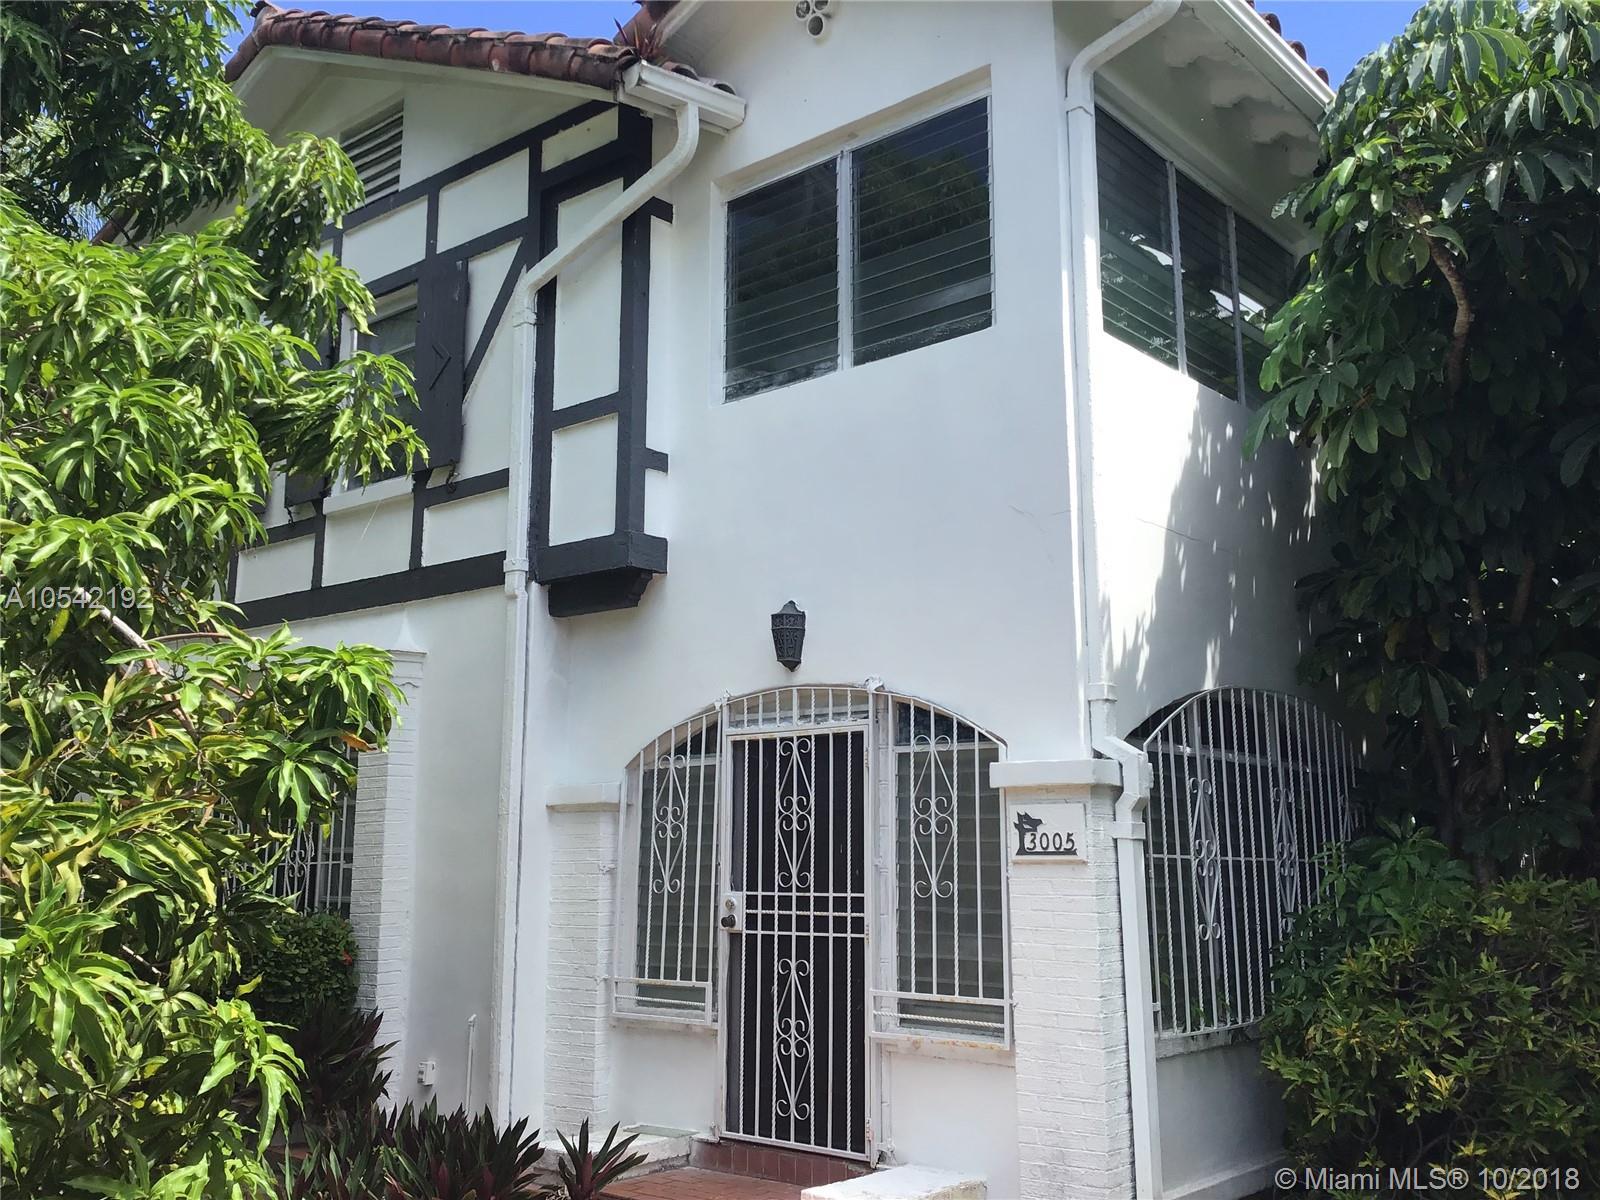 3005 N Bay Road, Miami Beach FL 33140